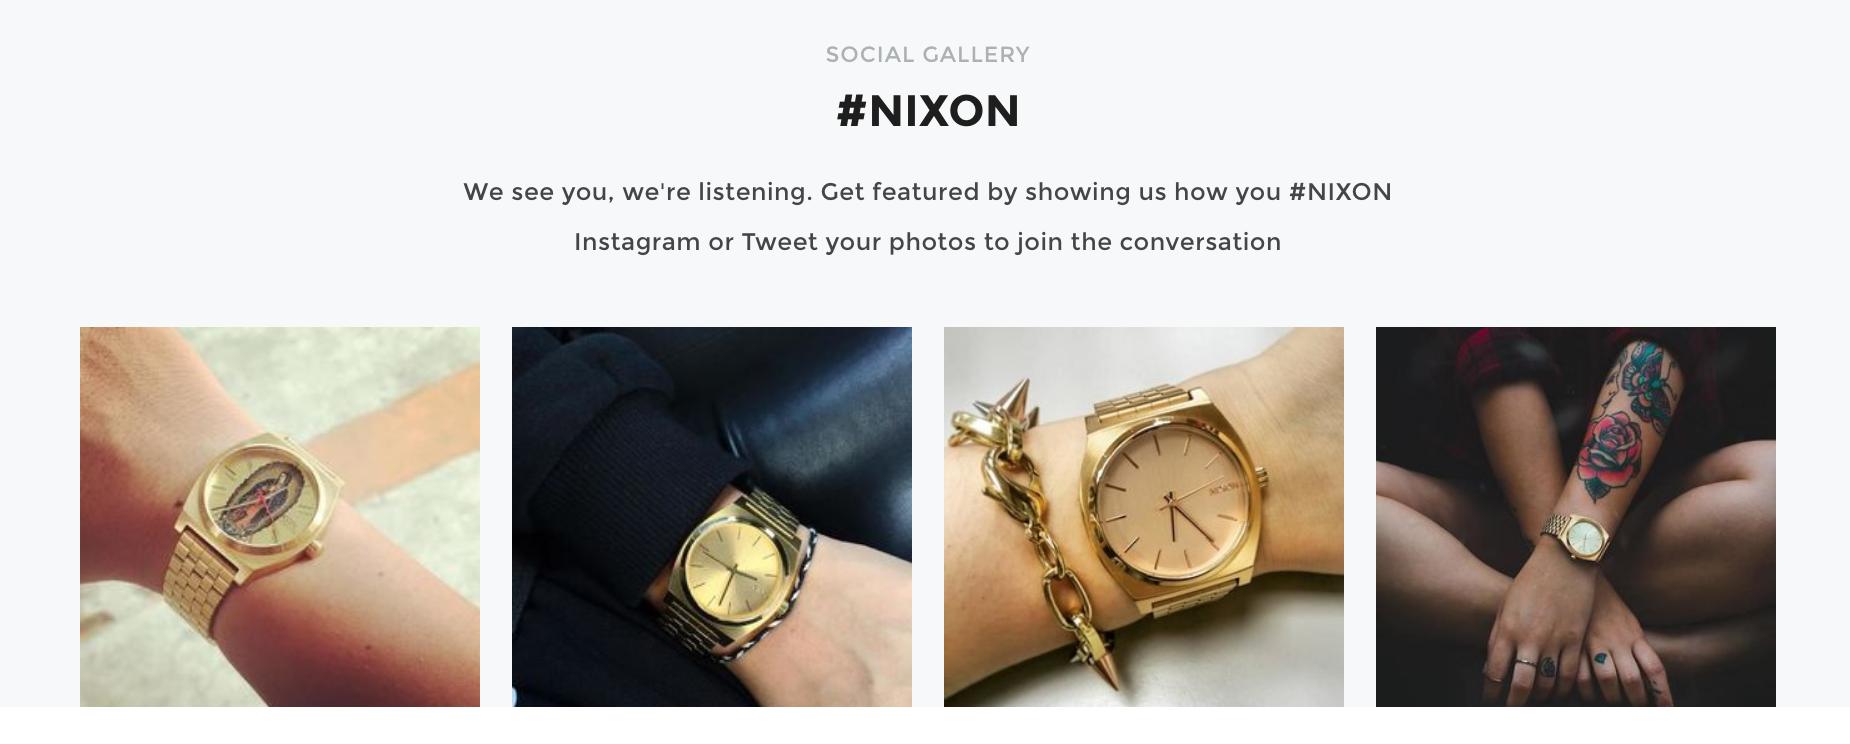 Nixon watches user photos